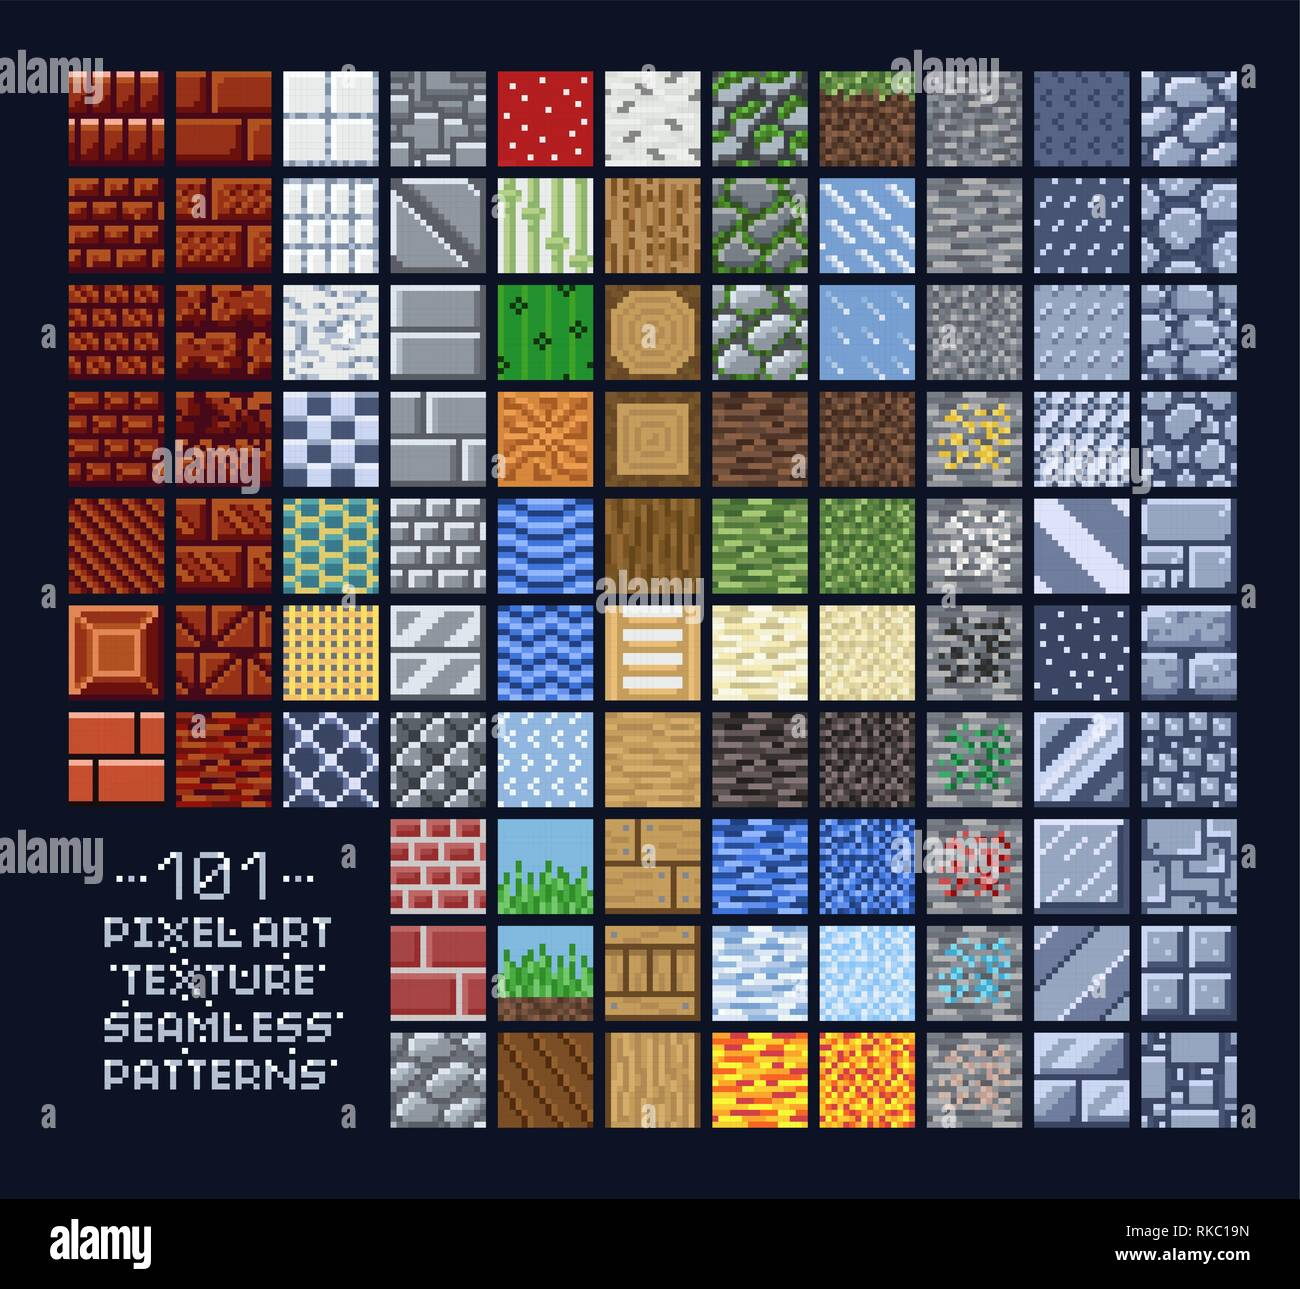 Pixel Art Style Set Of Different 16x16 Texture Pattern Sprites Stone Wood Brick Dirt Metal 8 Bit Game Design Background Tiles Stock Vector Image Art Alamy